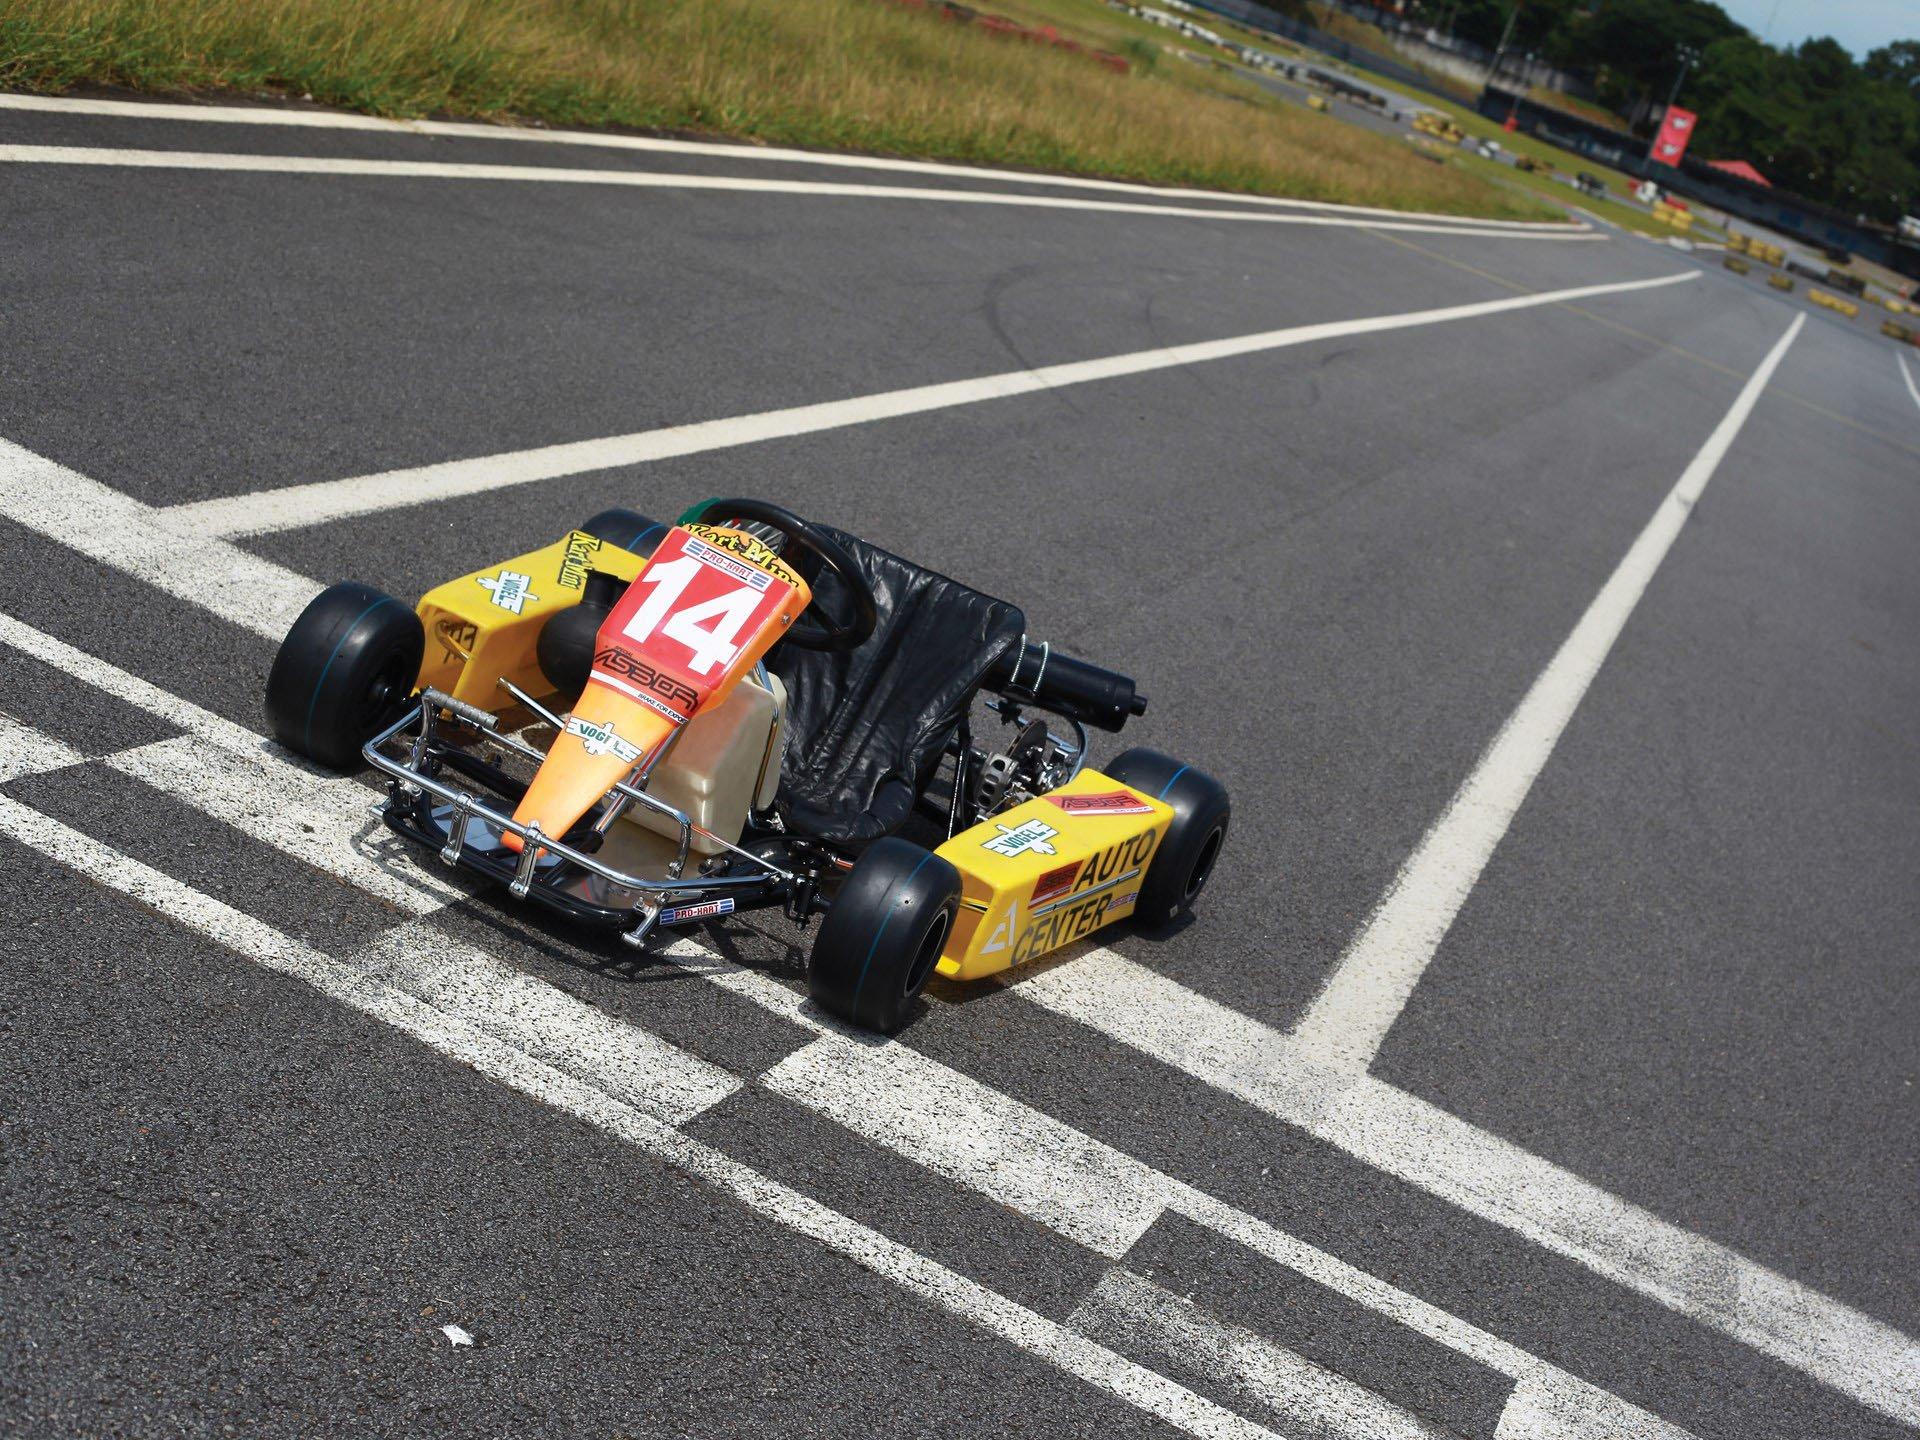 Last Kart Ayrton Senna 1